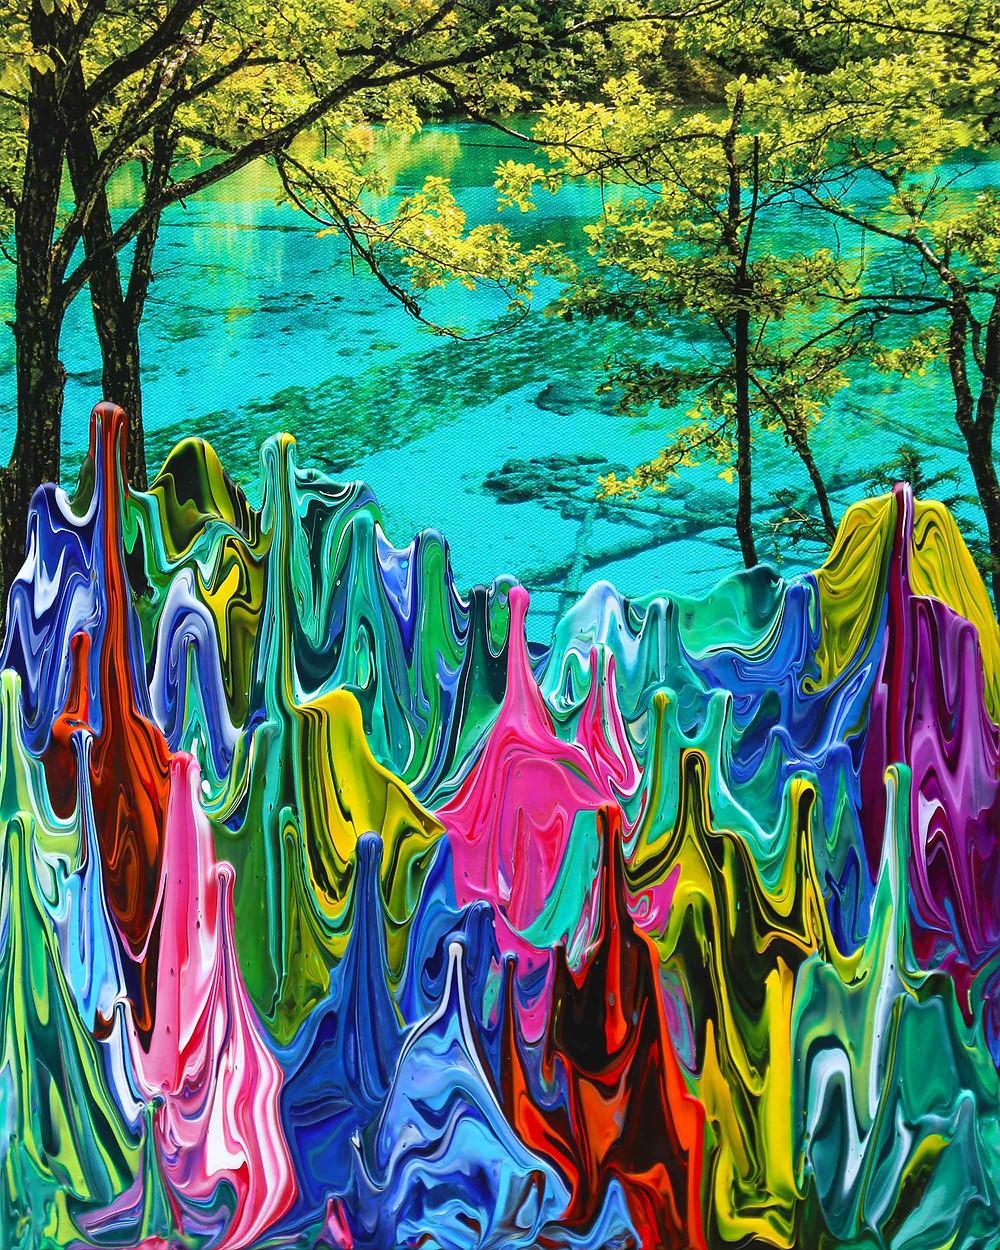 Five Color Pond - Gravity China (Jiuzhaigou) - 40cm x 50cm - artist Antonio Wehrli